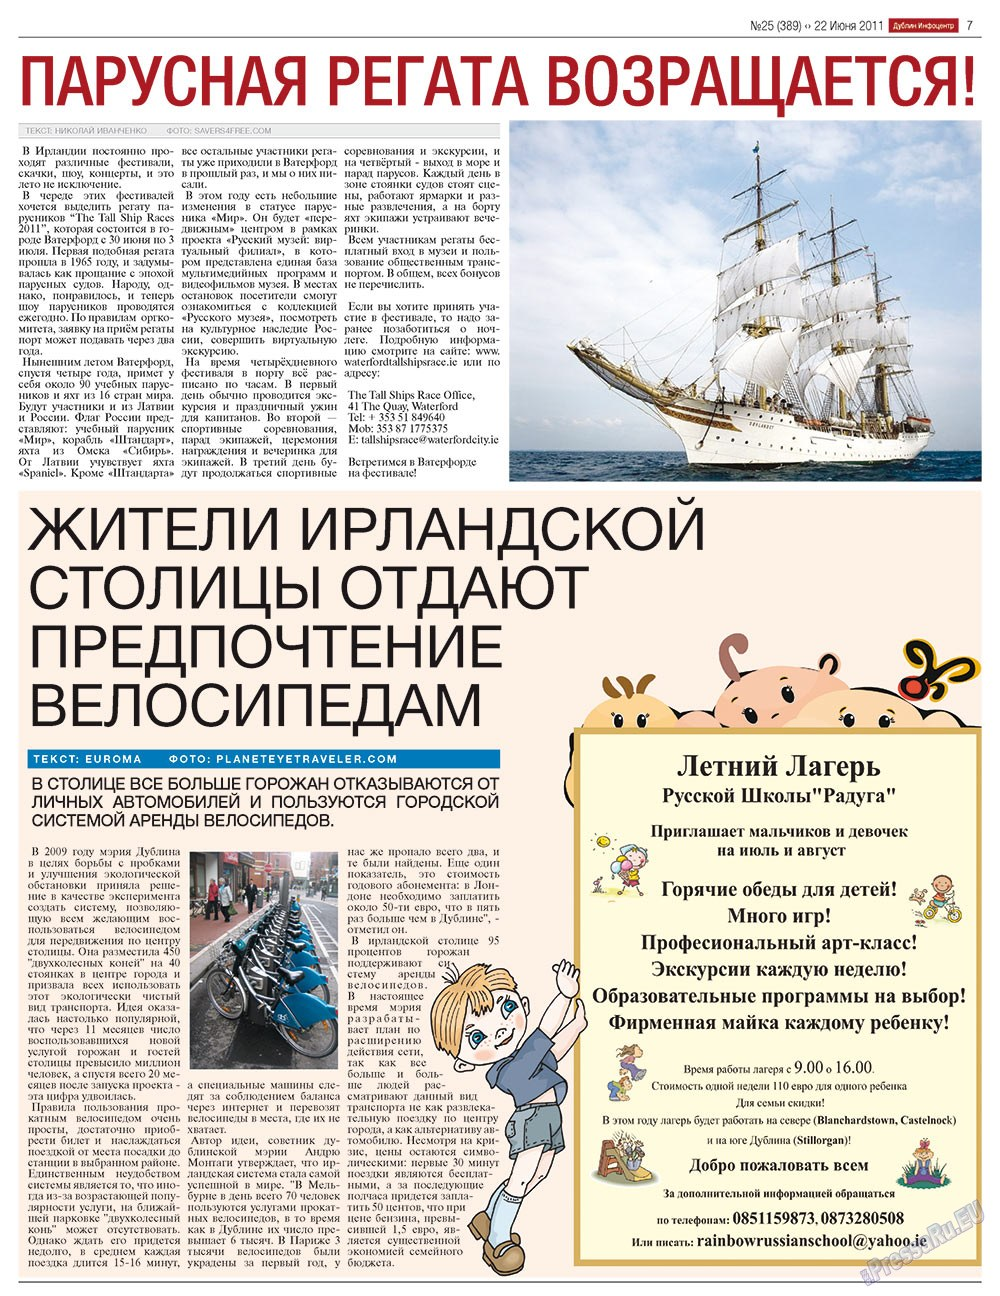 Дублин инфоцентр (газета). 2011 год, номер 25, стр. 7